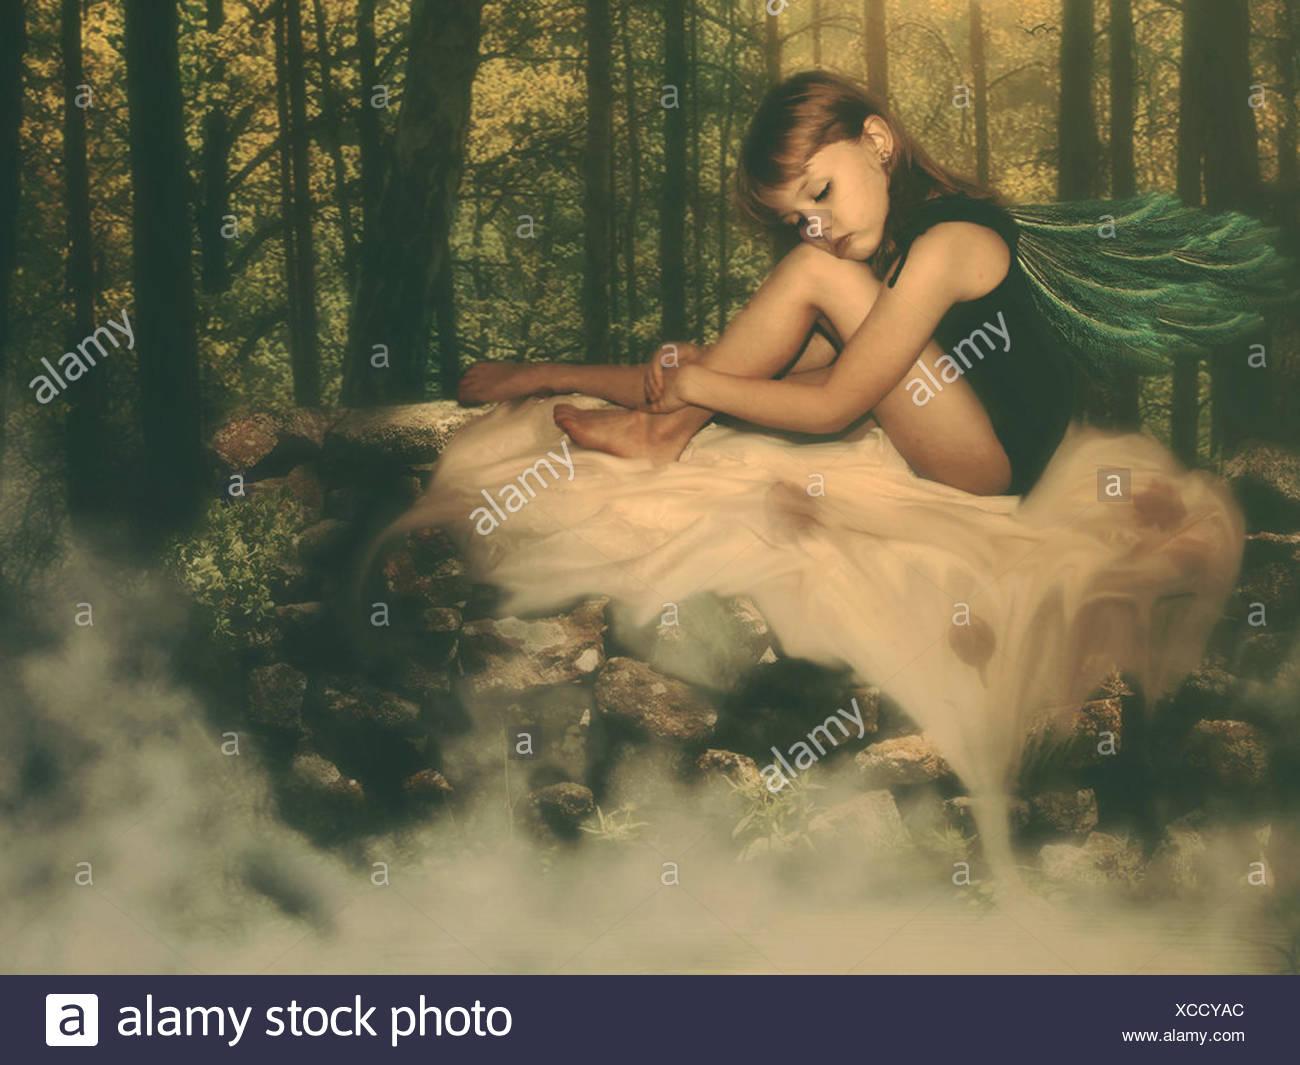 Fairy in woods - Stock Image